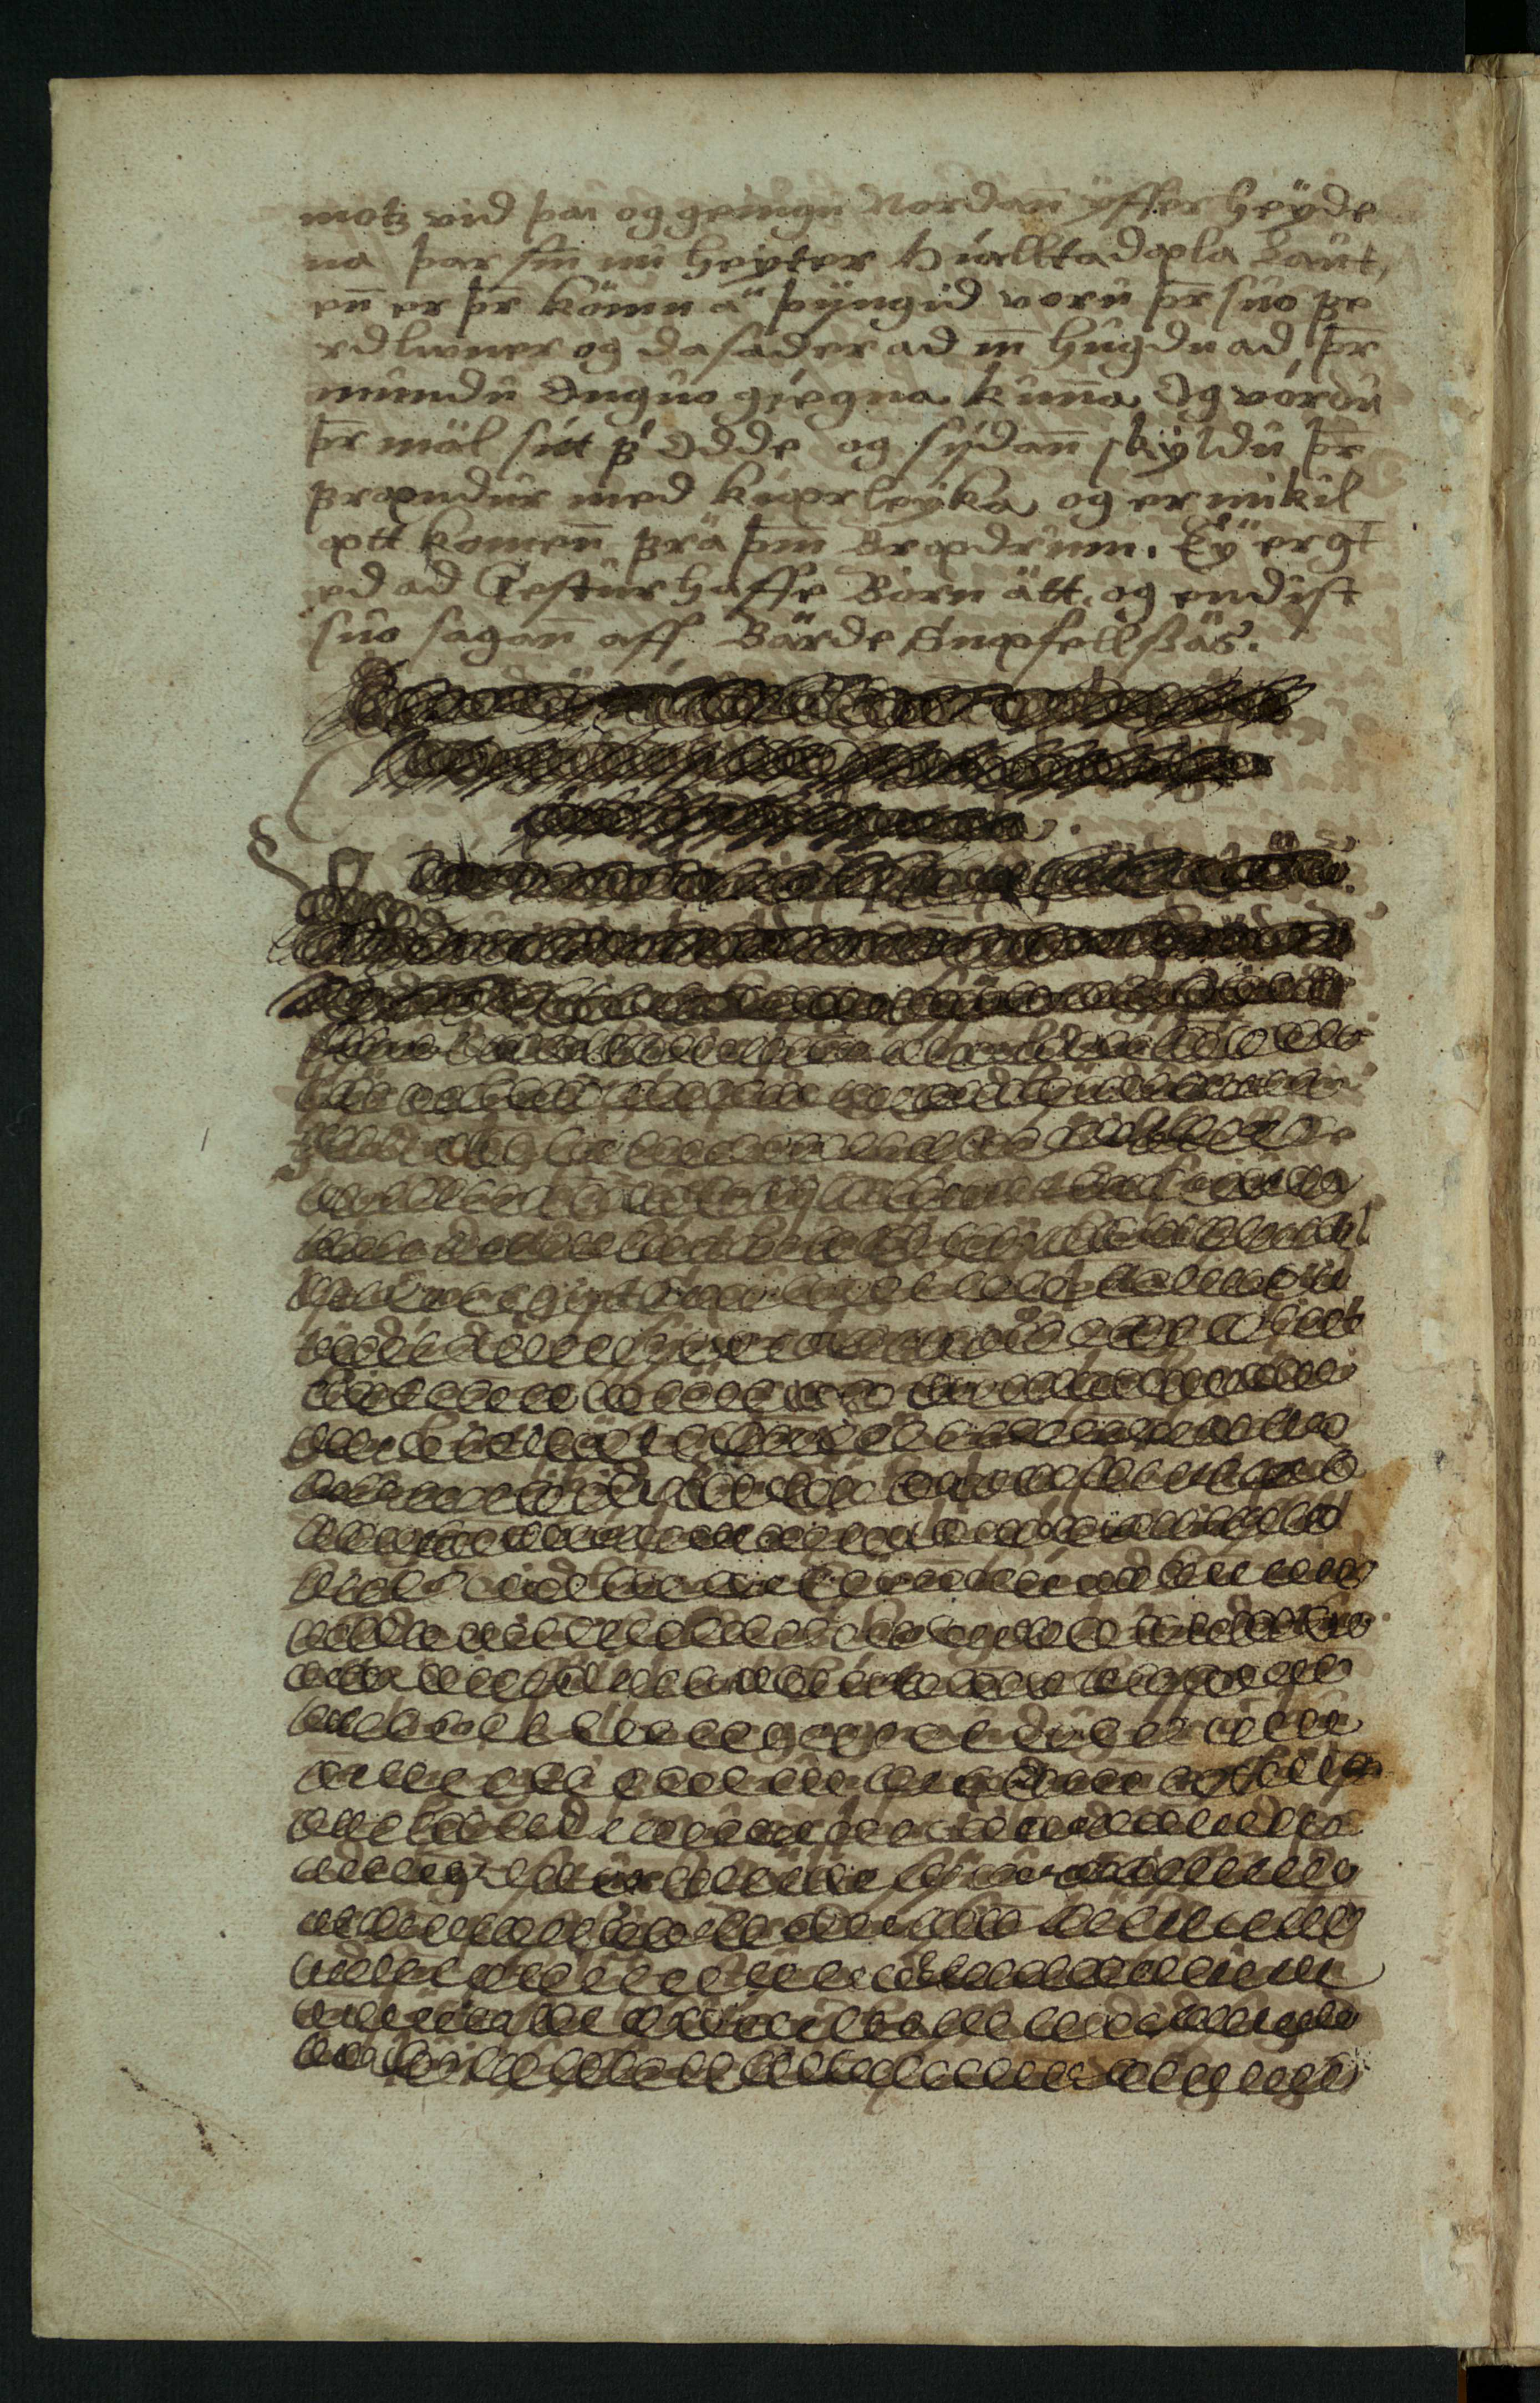 AM 165 g fol - 22v